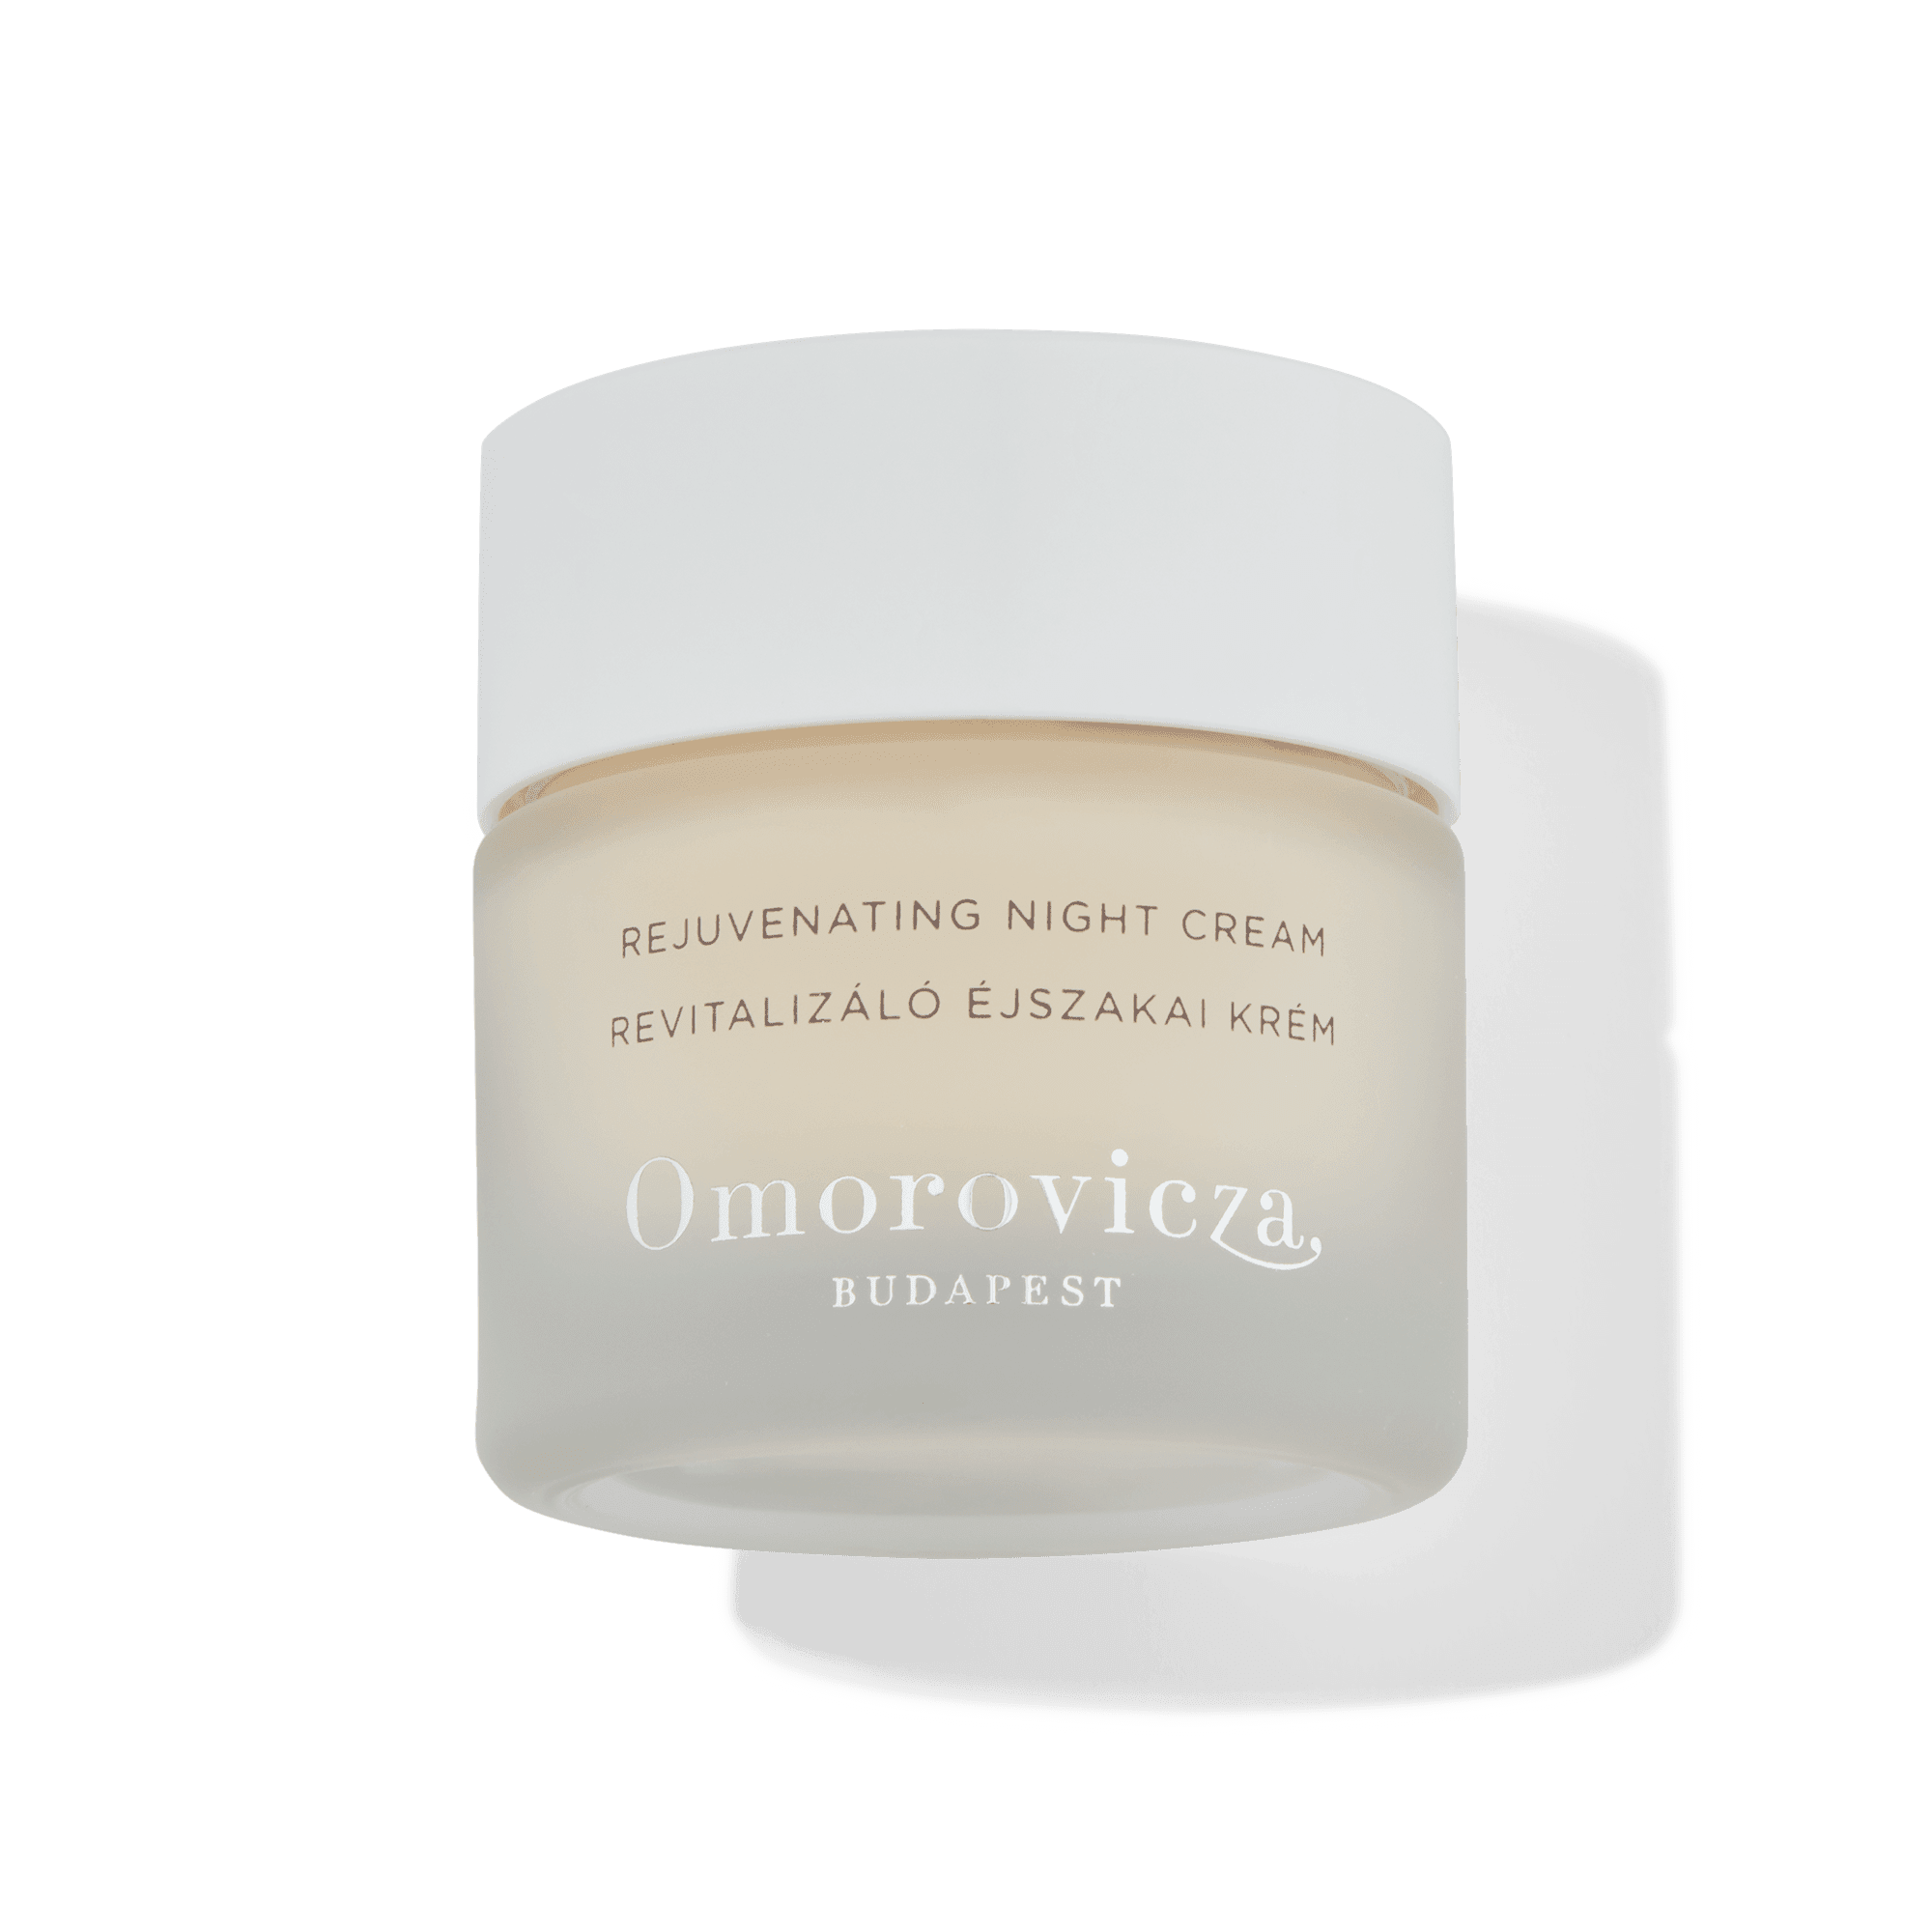 omorovicza rejuvenating night cream in a tub